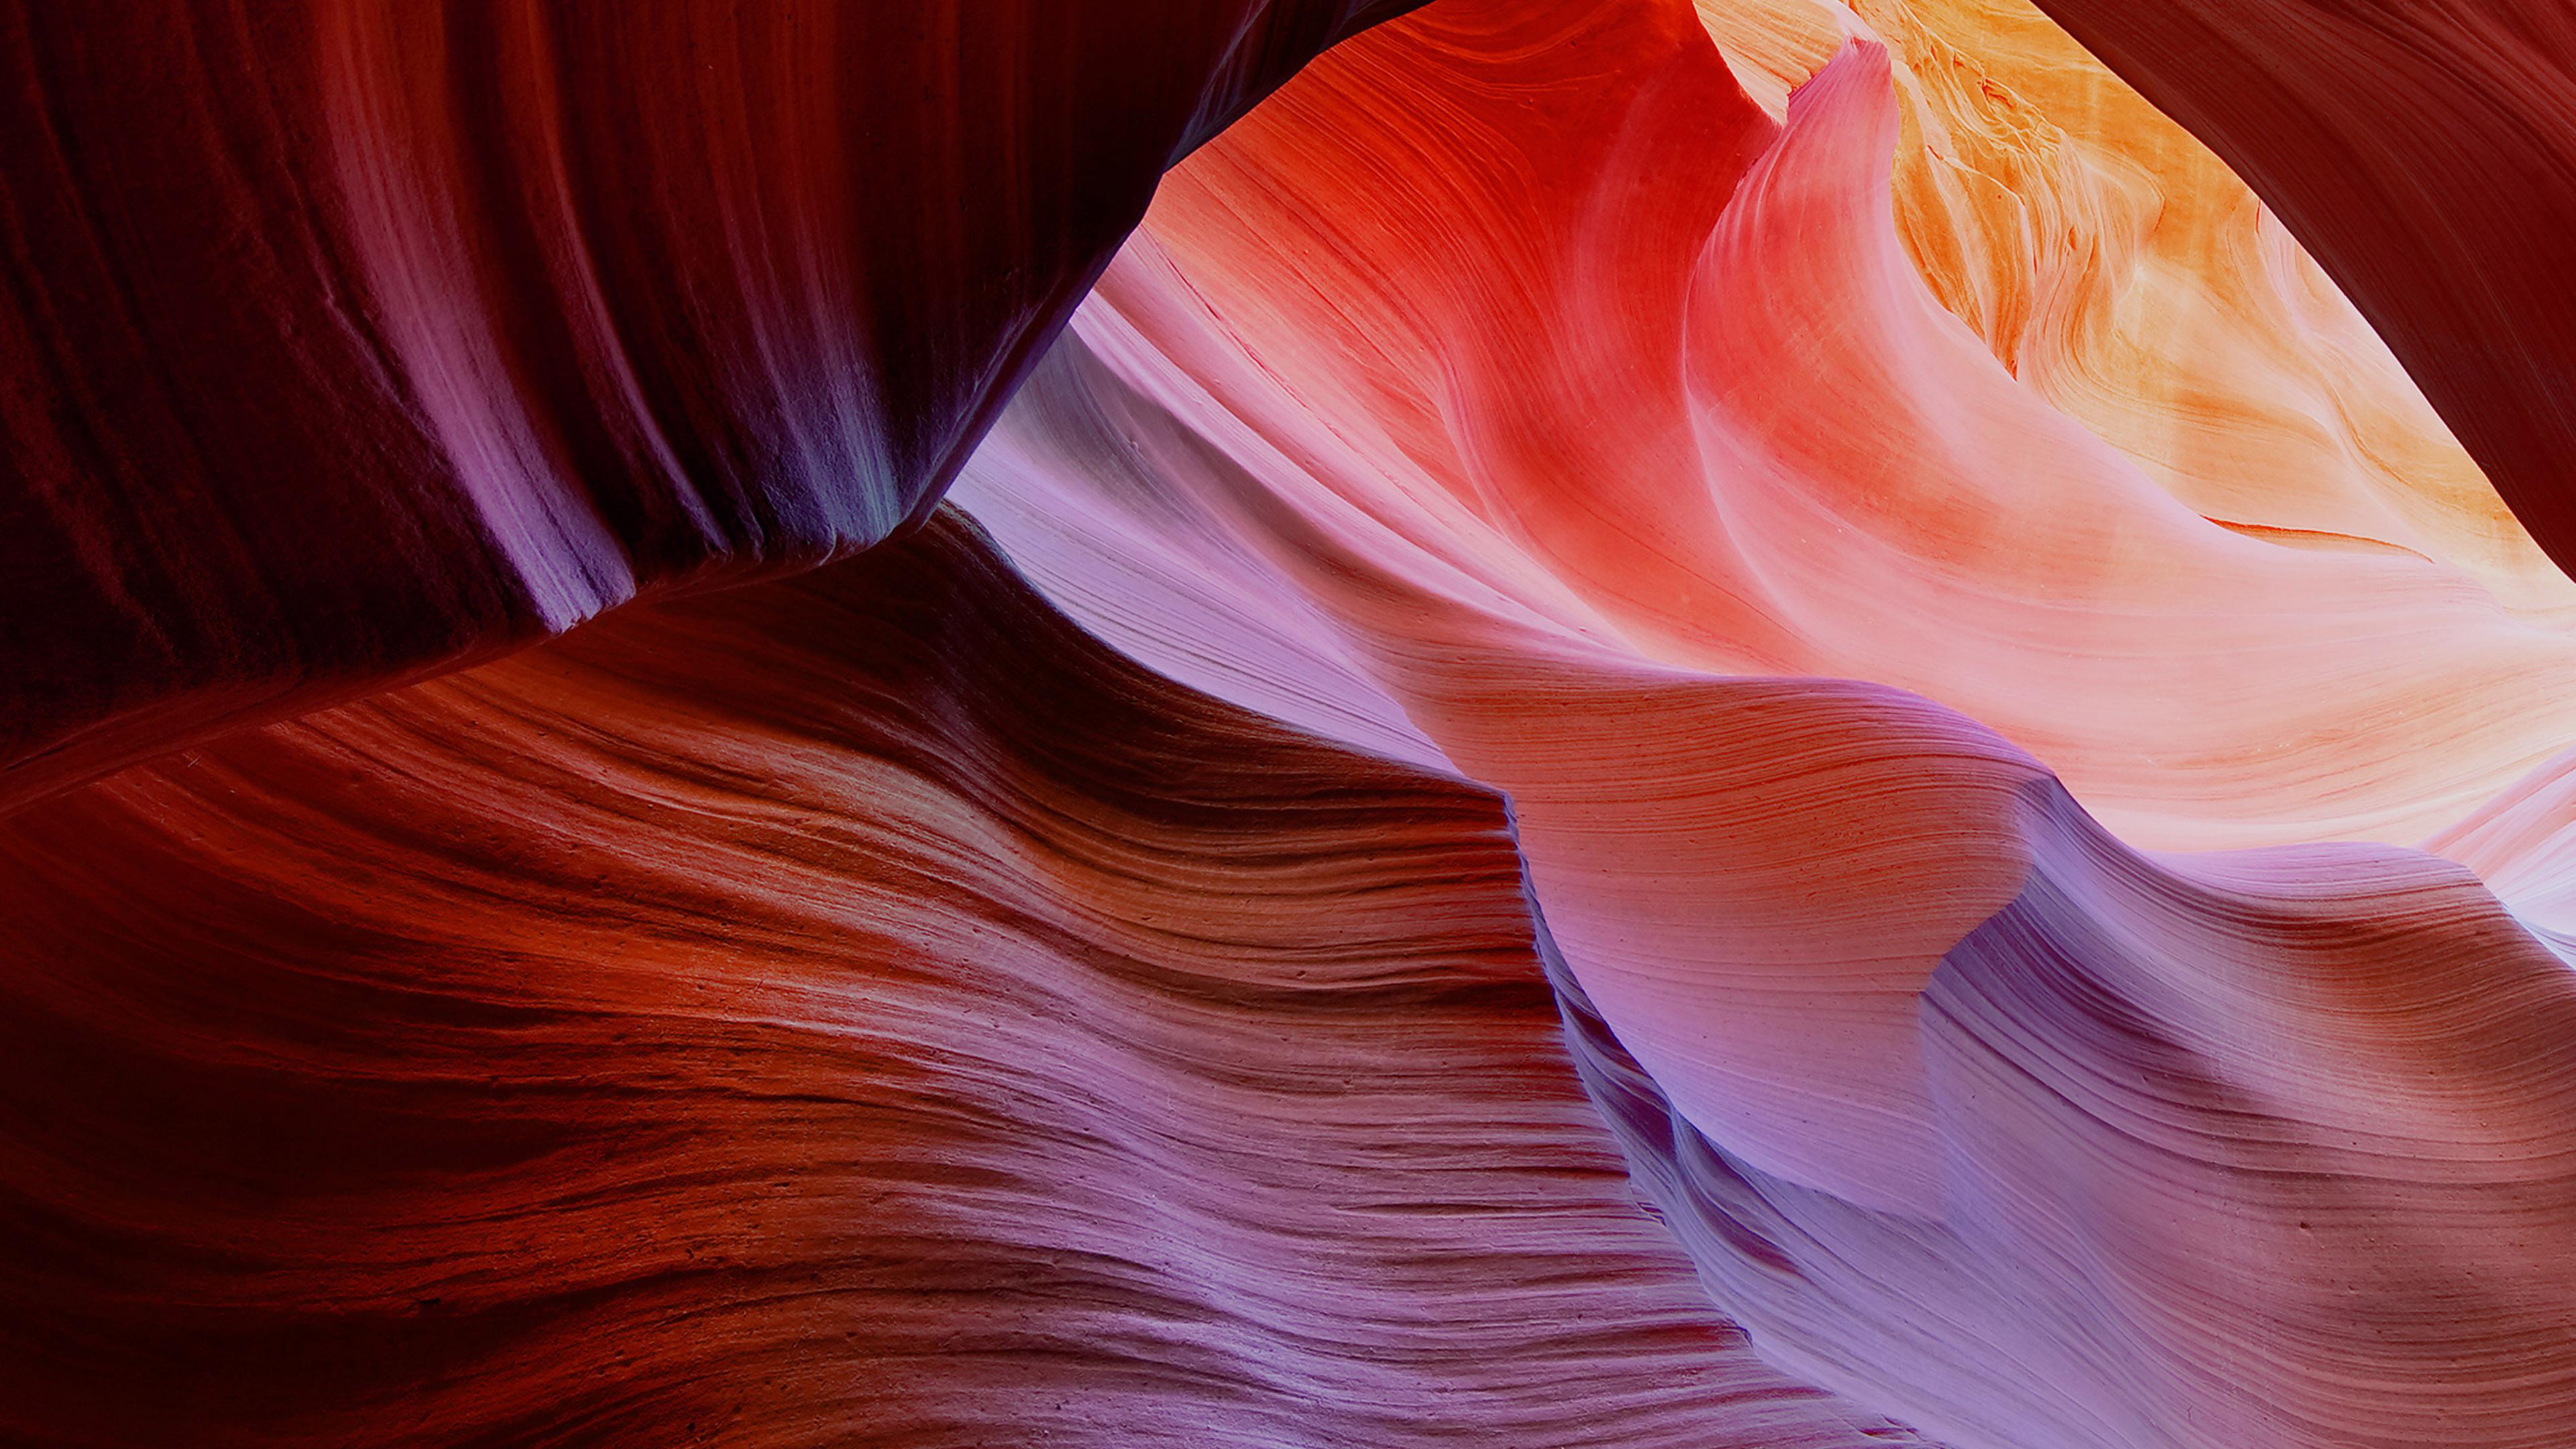 wallpaper for desktop, laptop | mi28-antelope-canyon ...